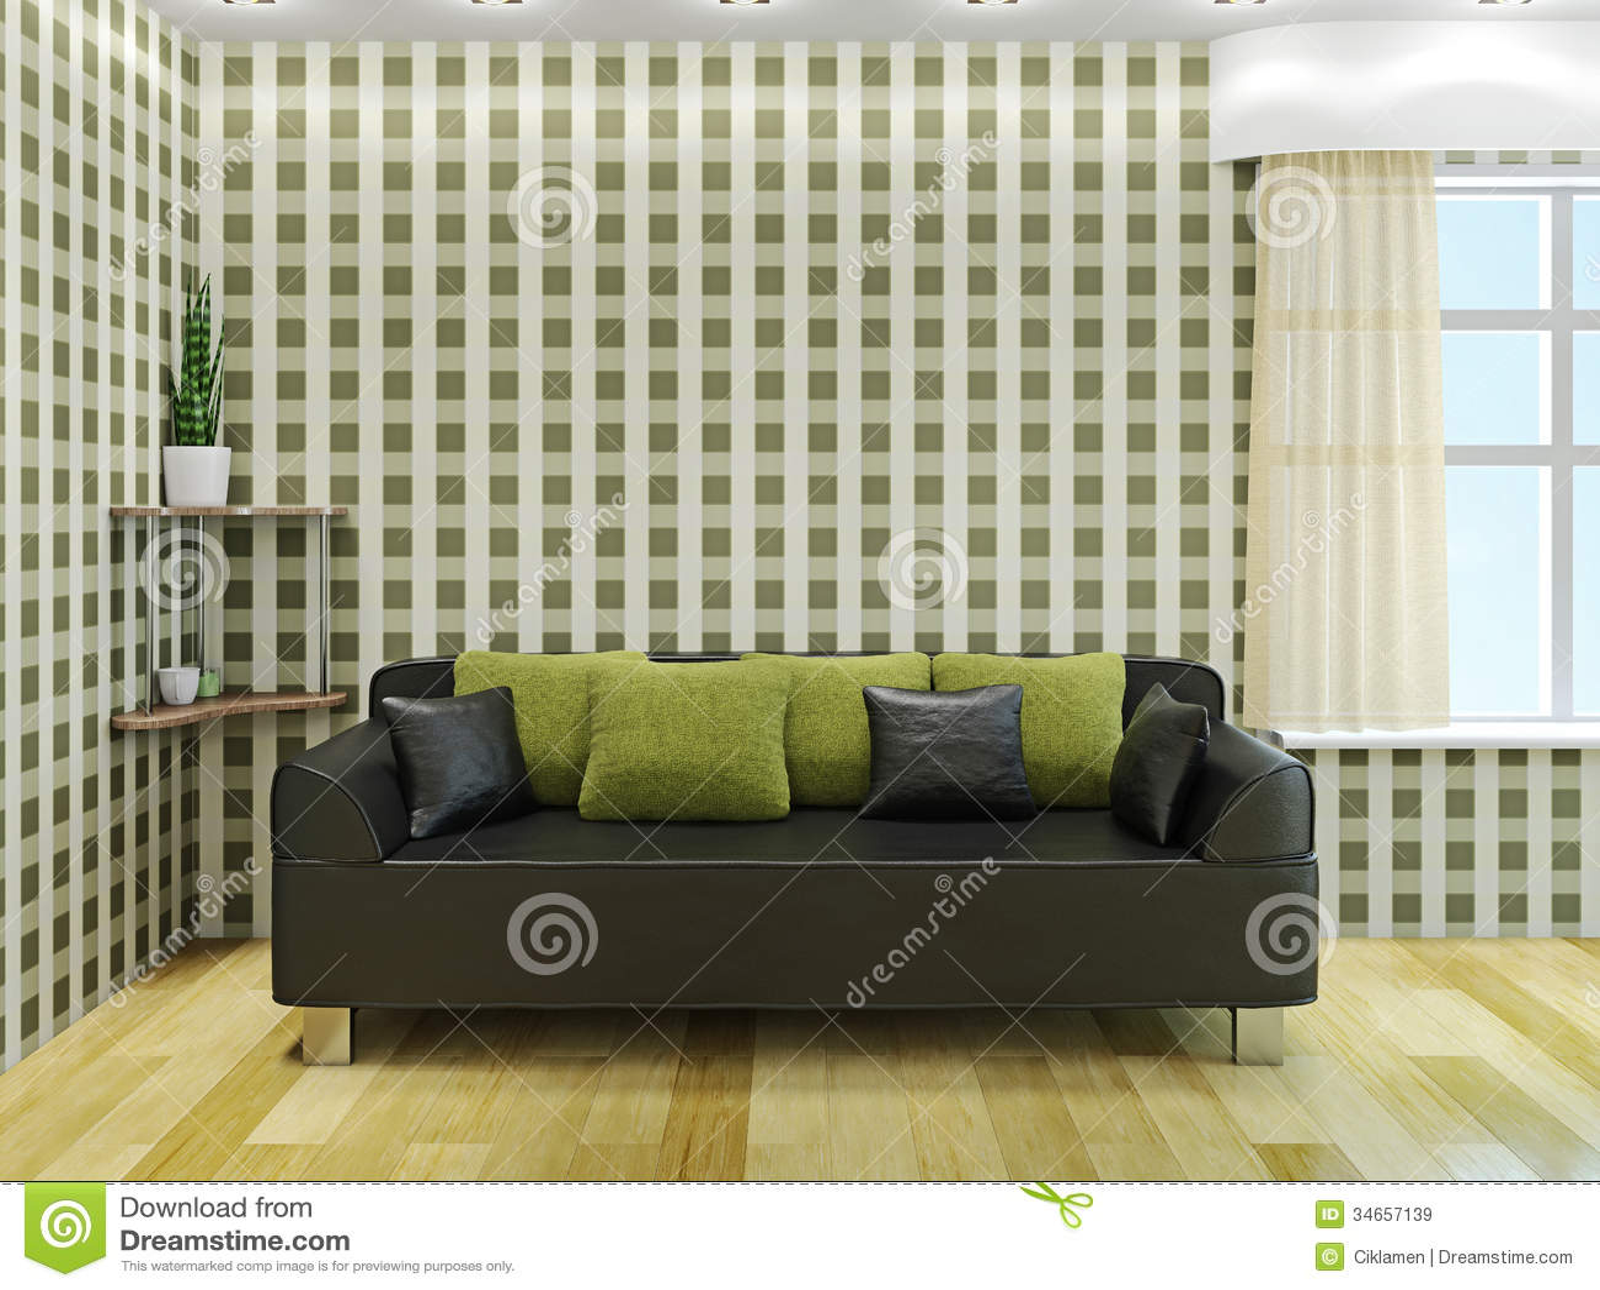 Kuddar i soffa Рm̦bel f̦r k̦k, sovrum